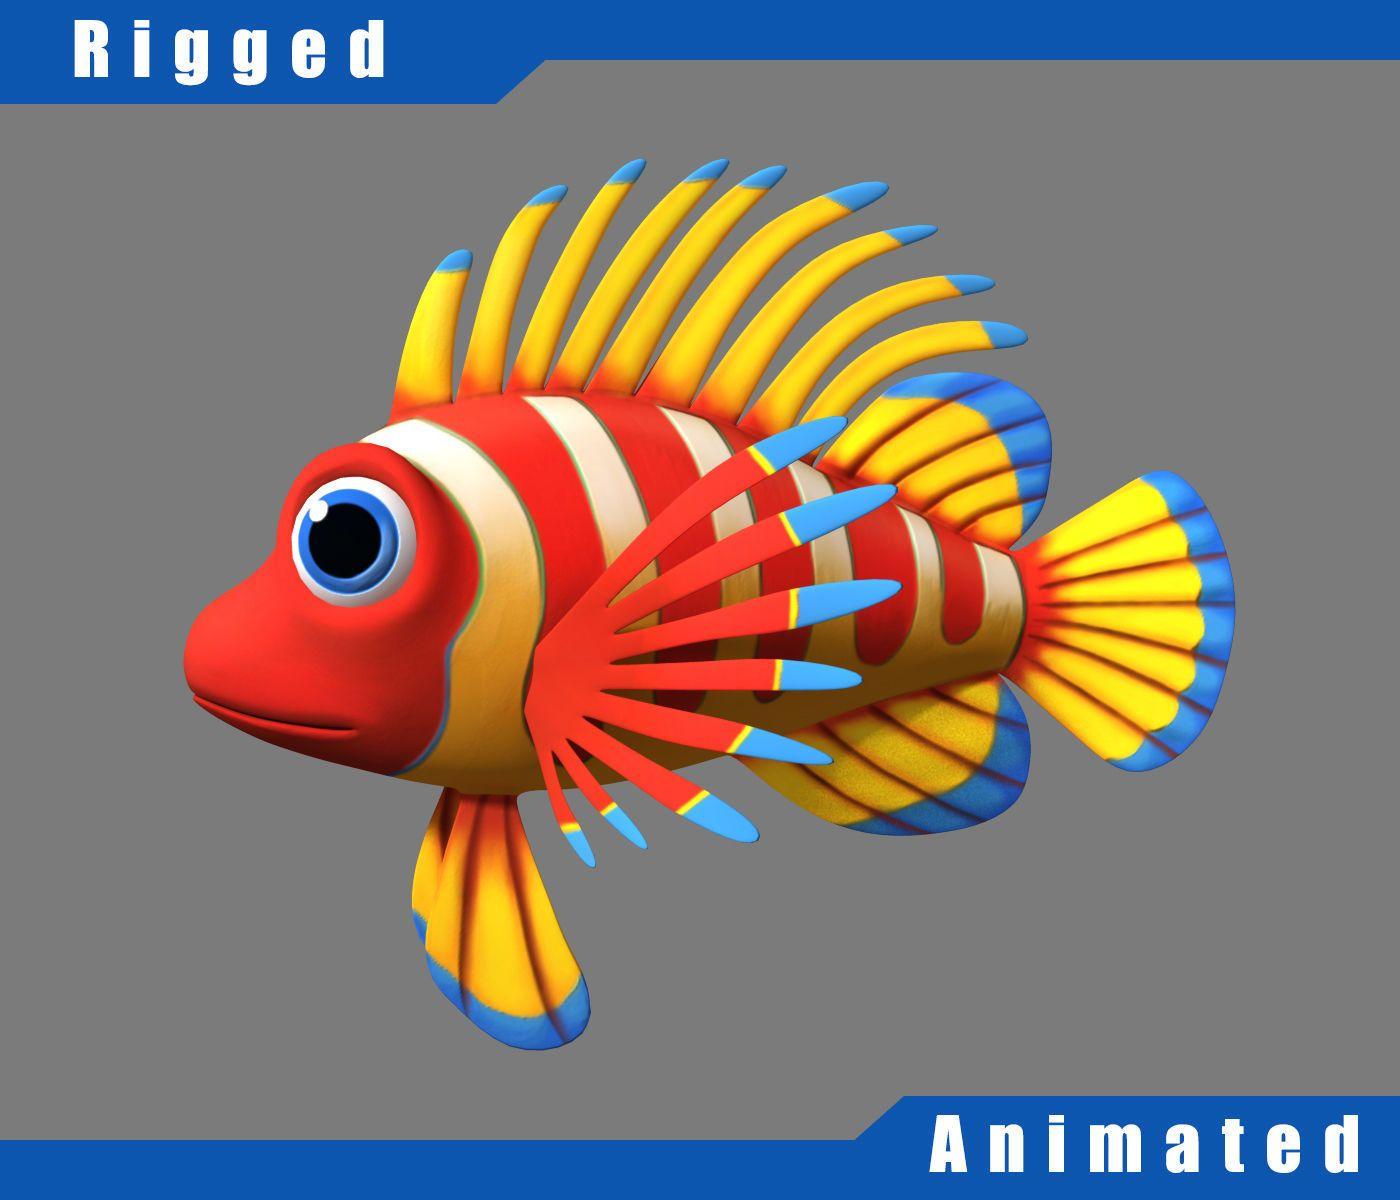 cartoon underwater scene rigged animated 3d model - HD1400×1200